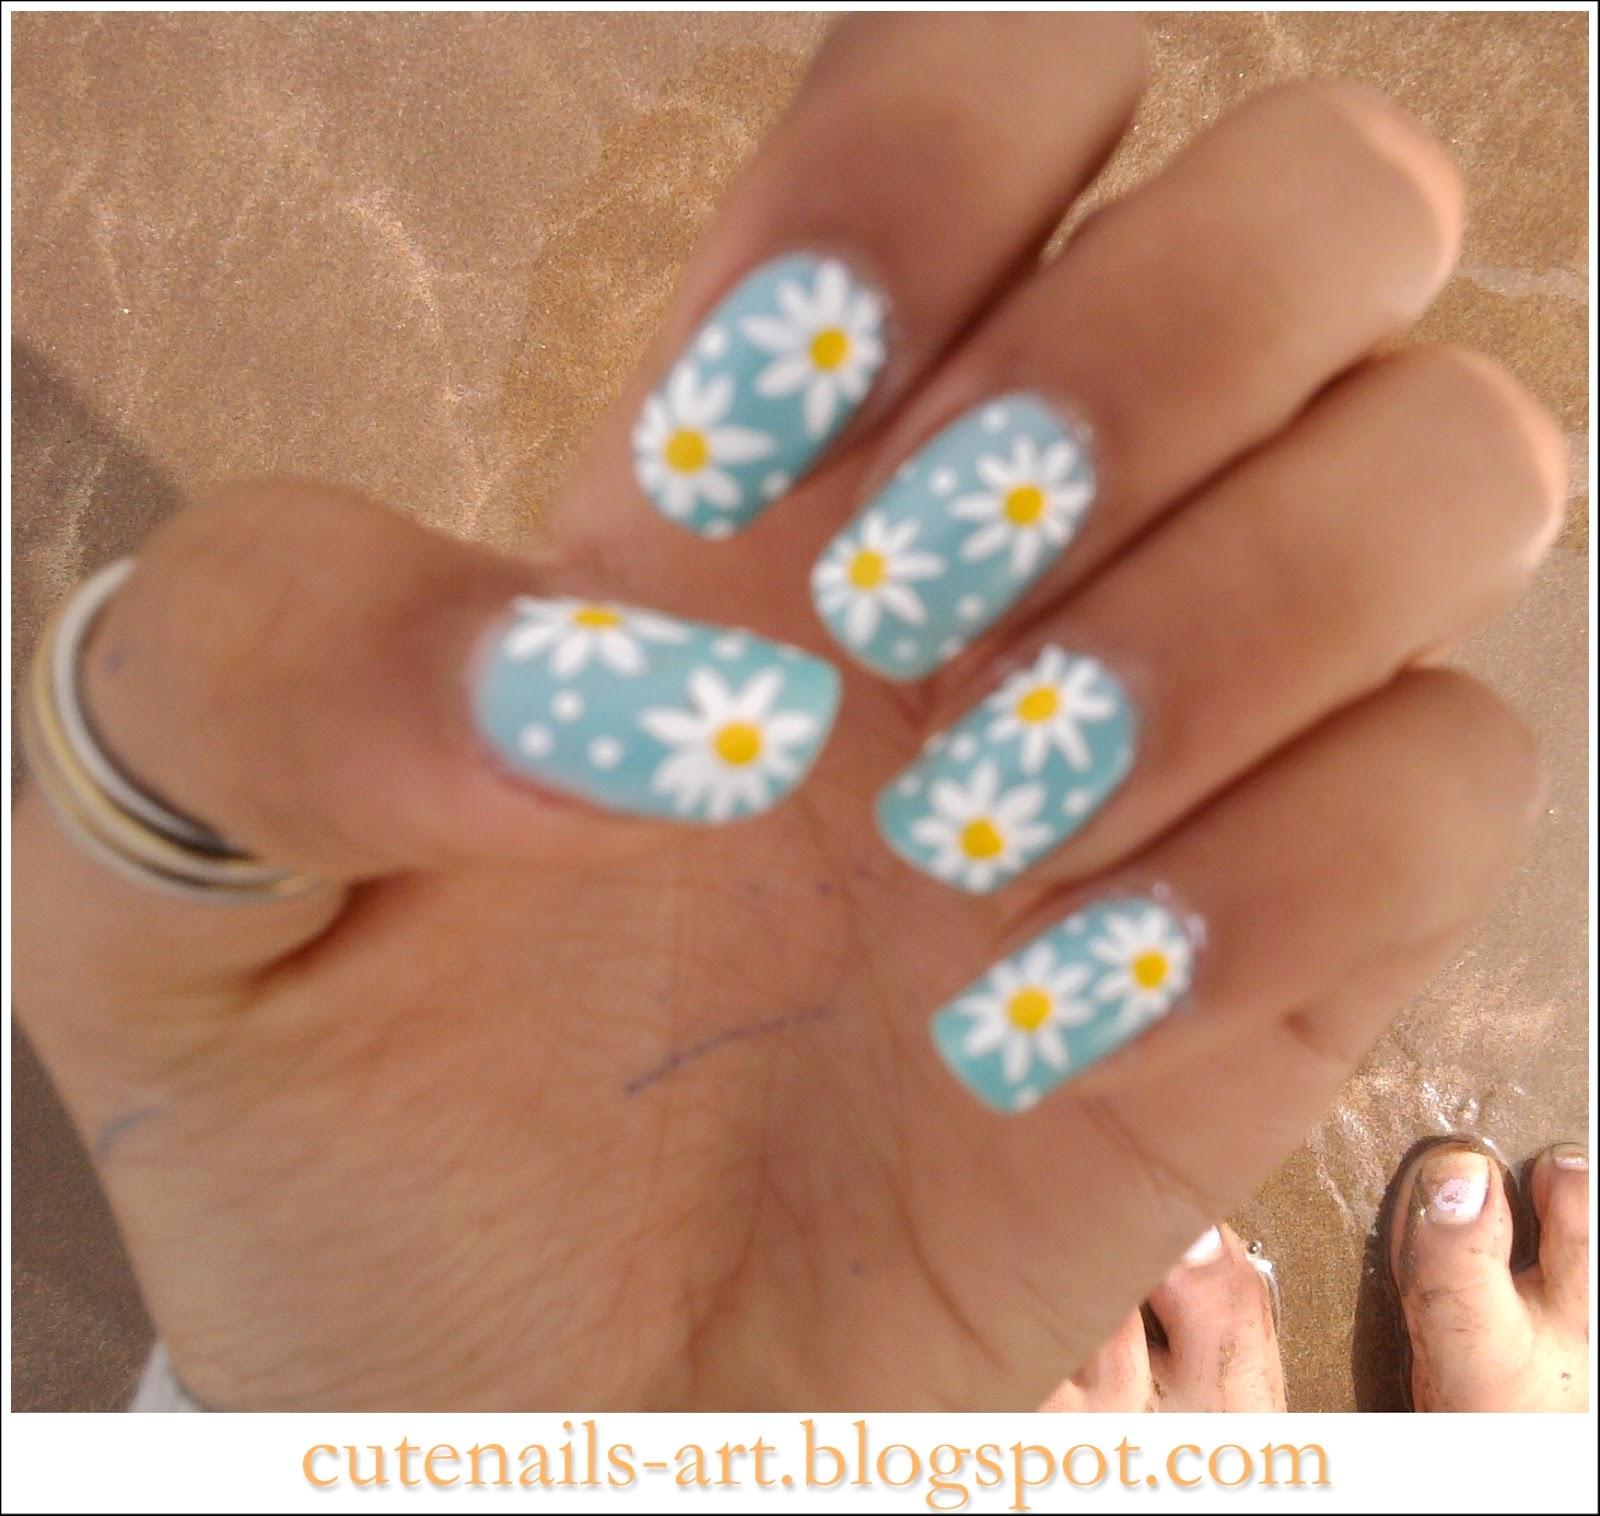 Flower Nail Art: Cutenails-art: Spring Nails Art : Daisy Flowers